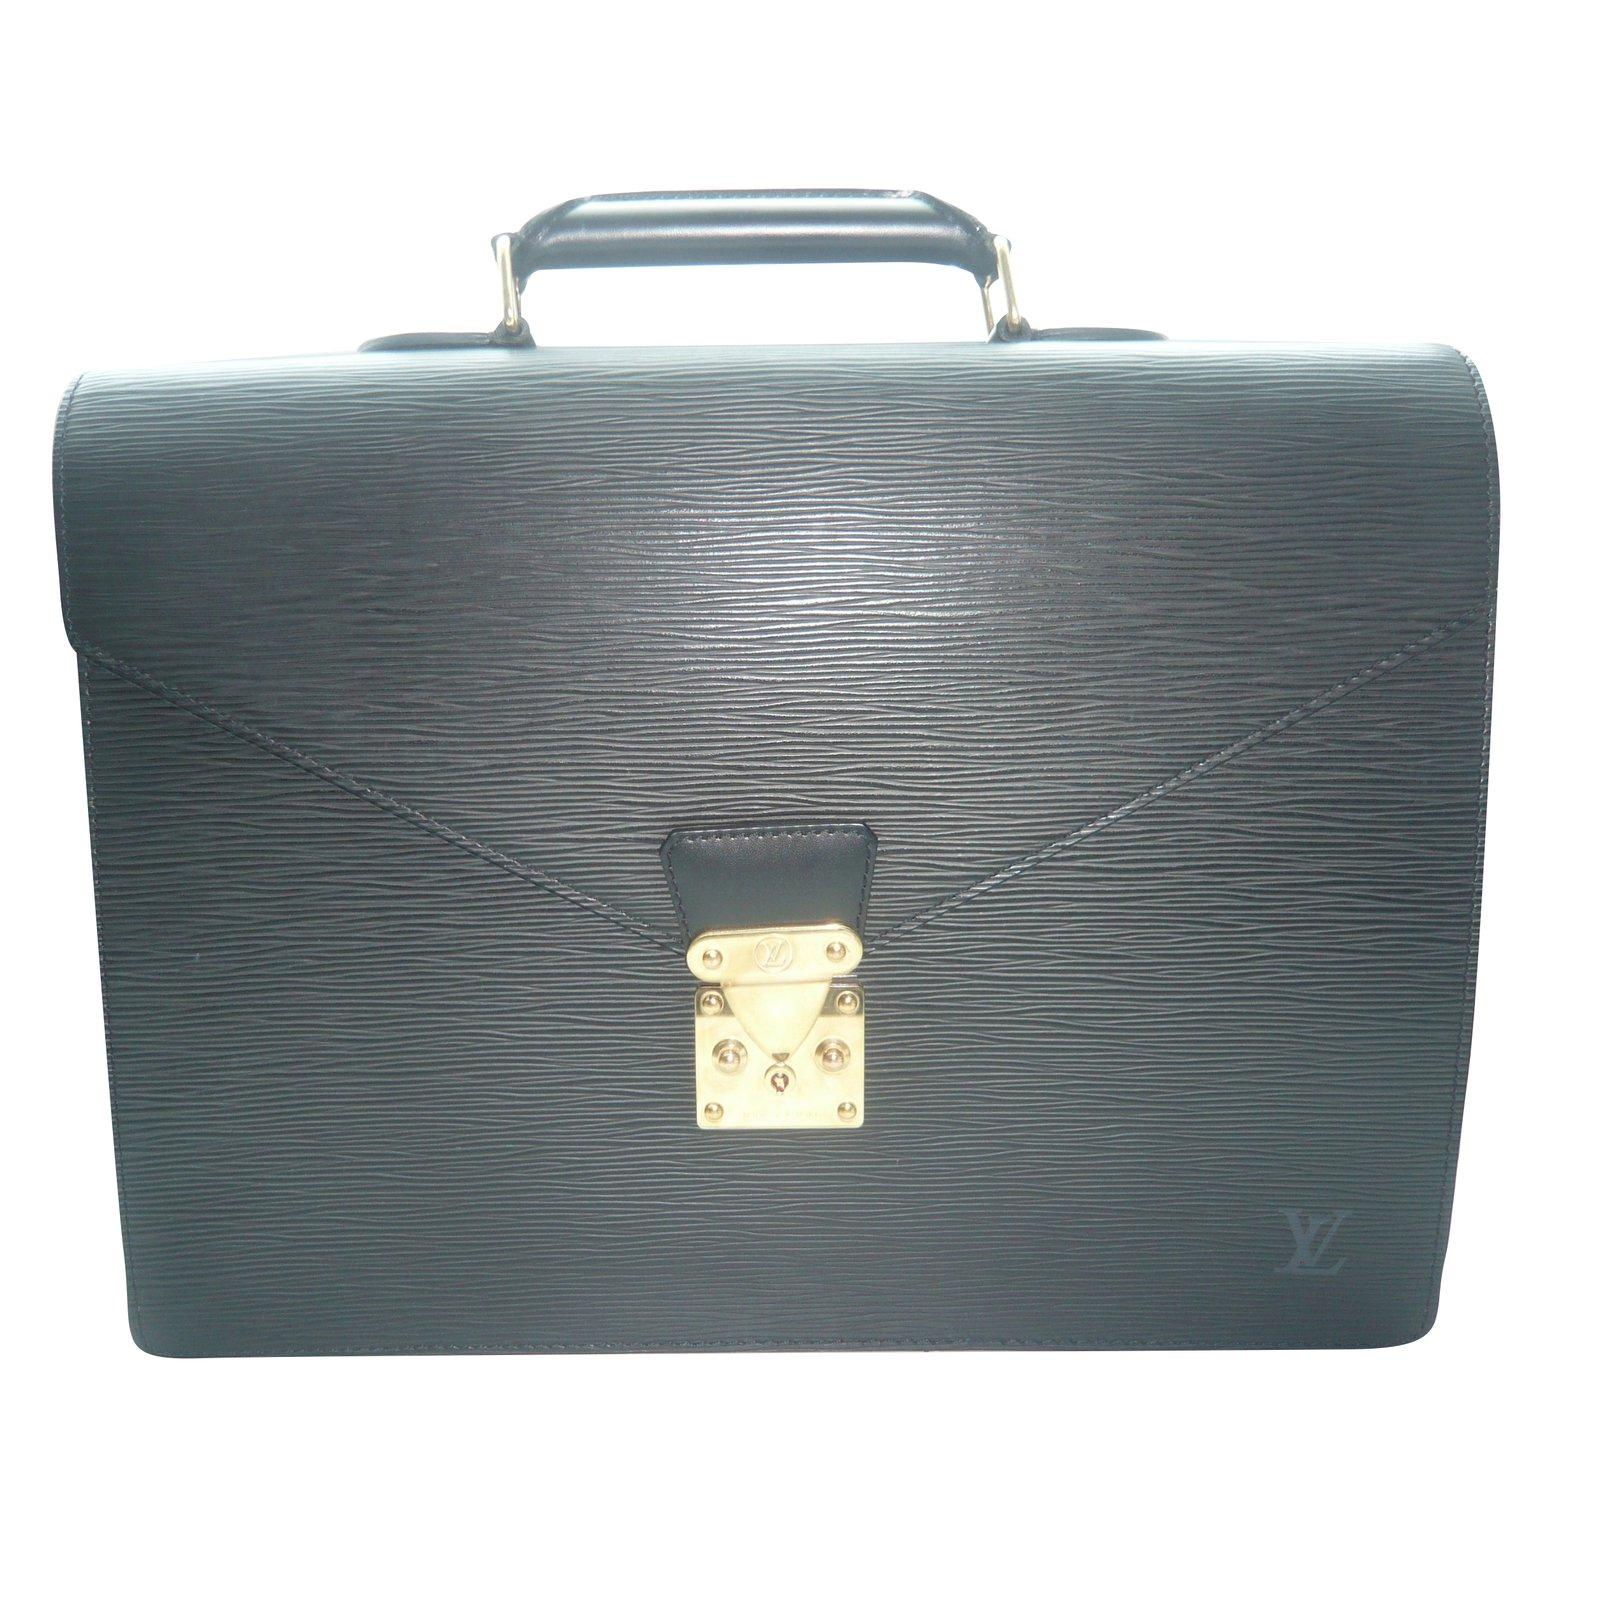 74292feeeeaed Louis Vuitton LOUIS VUITTON ORIGINAL AMBASSADOR BRIEFCASE SERVIETTE  BLACK NOIR LEATHER CUIR EPI